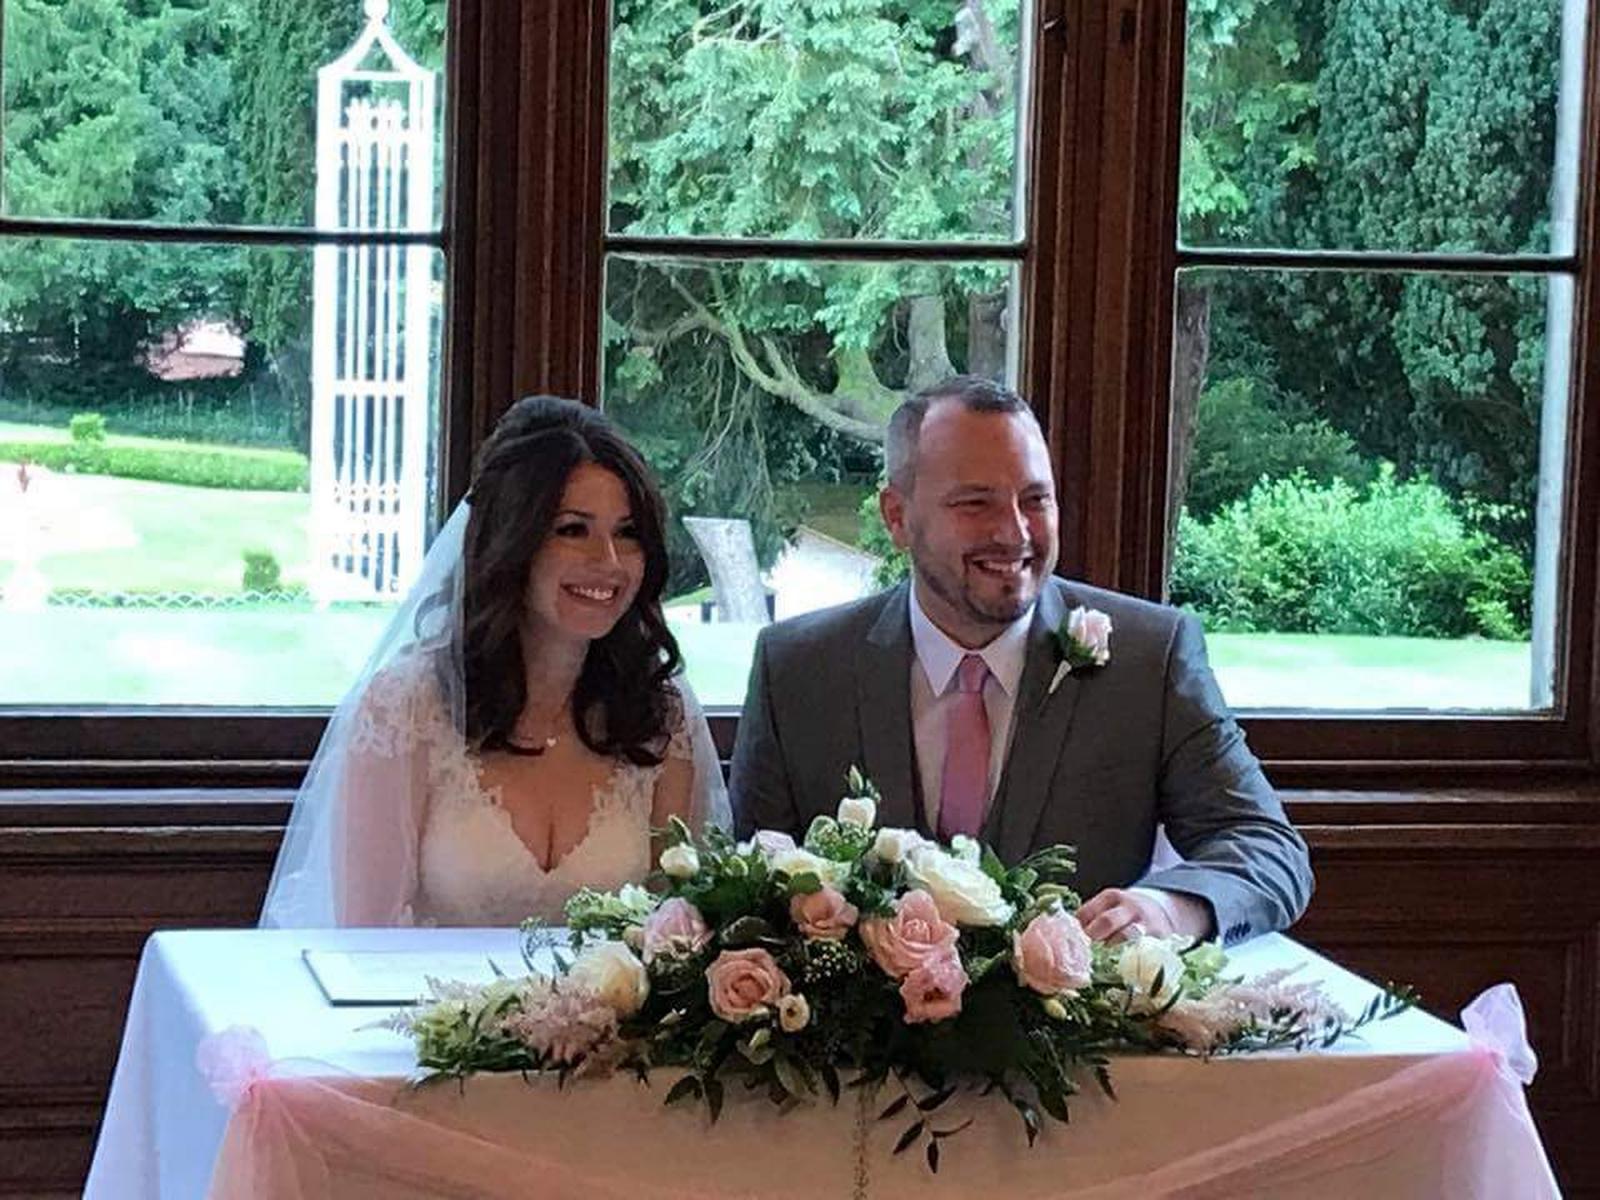 hawkesyard-estate-wedding-flowers-rugeley-florist-staffordshire-017